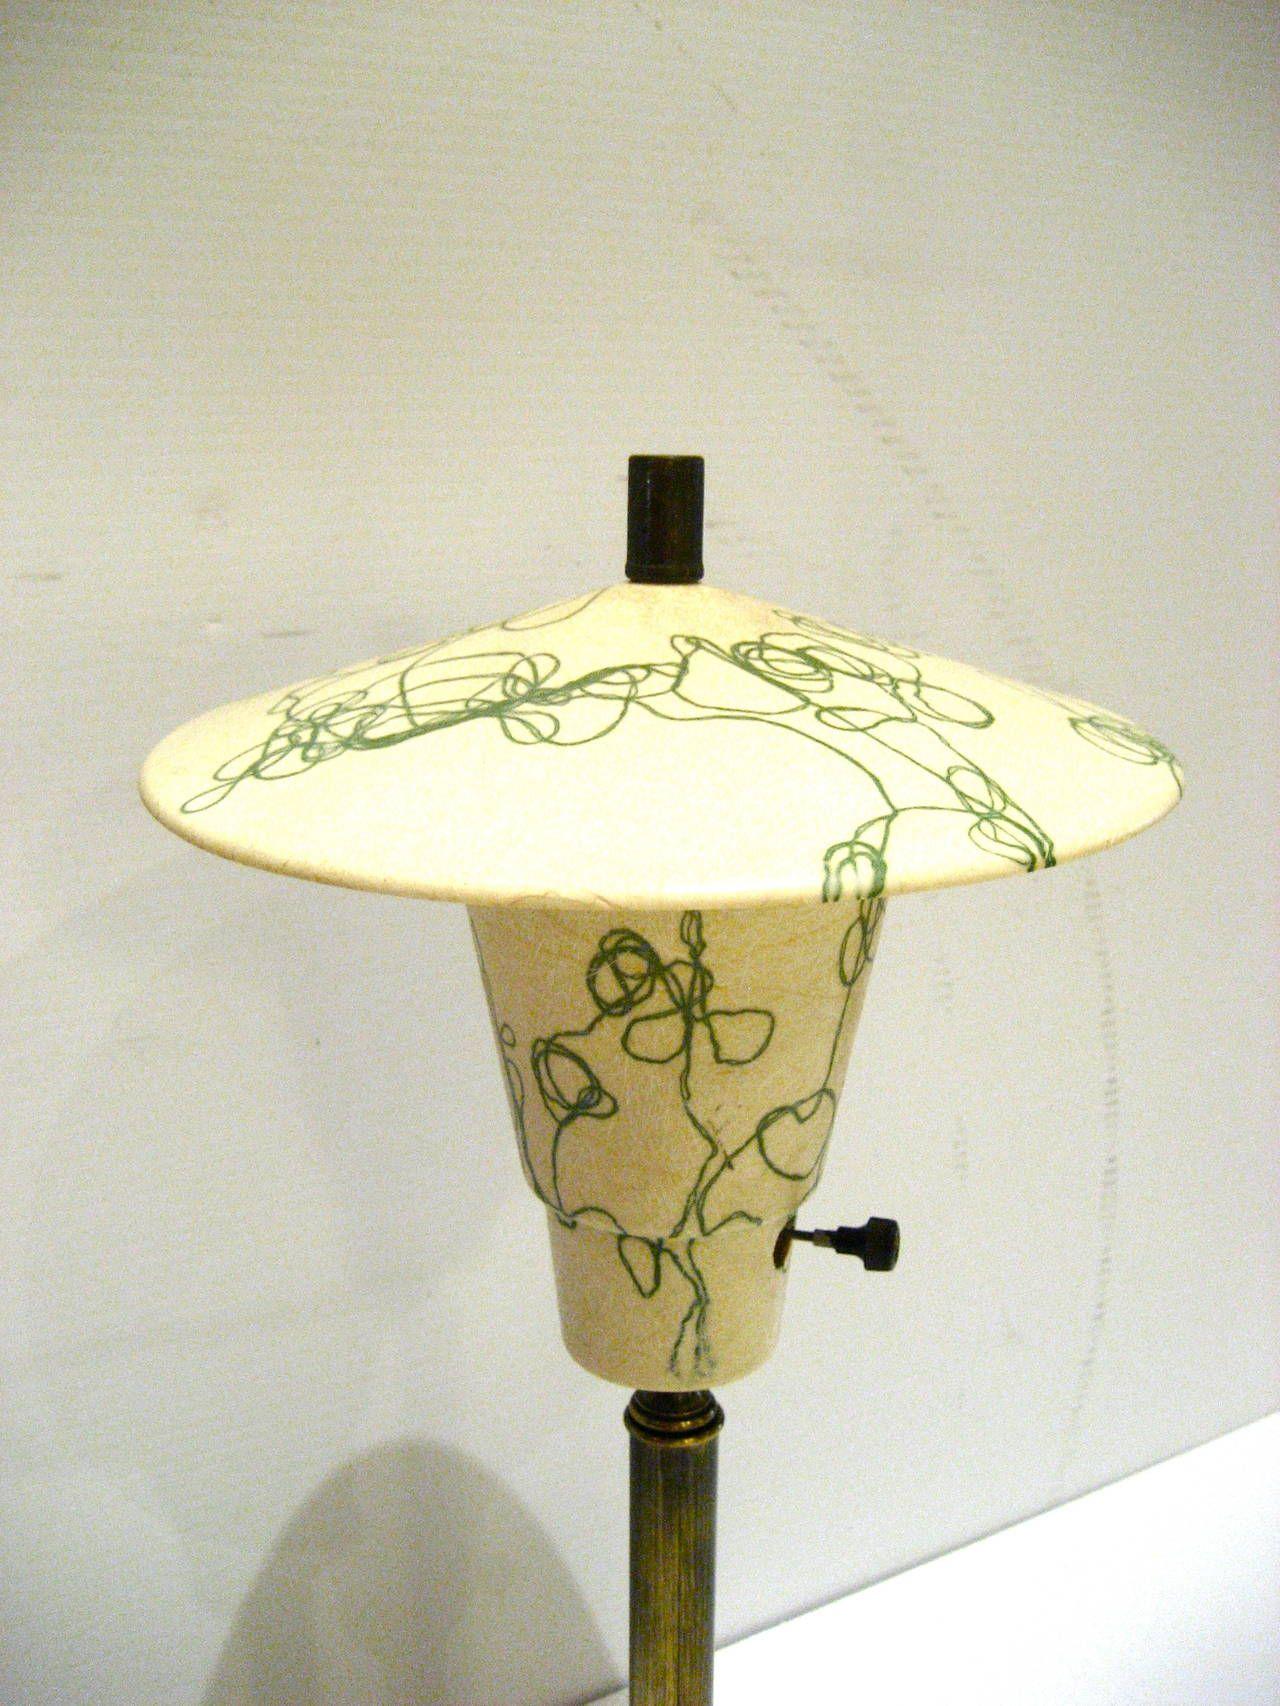 1950s american fiberglass lamp shade desk lamp california design 1950s american fiberglass lamp shade desk lamp california design from a unique collection of antique aloadofball Choice Image